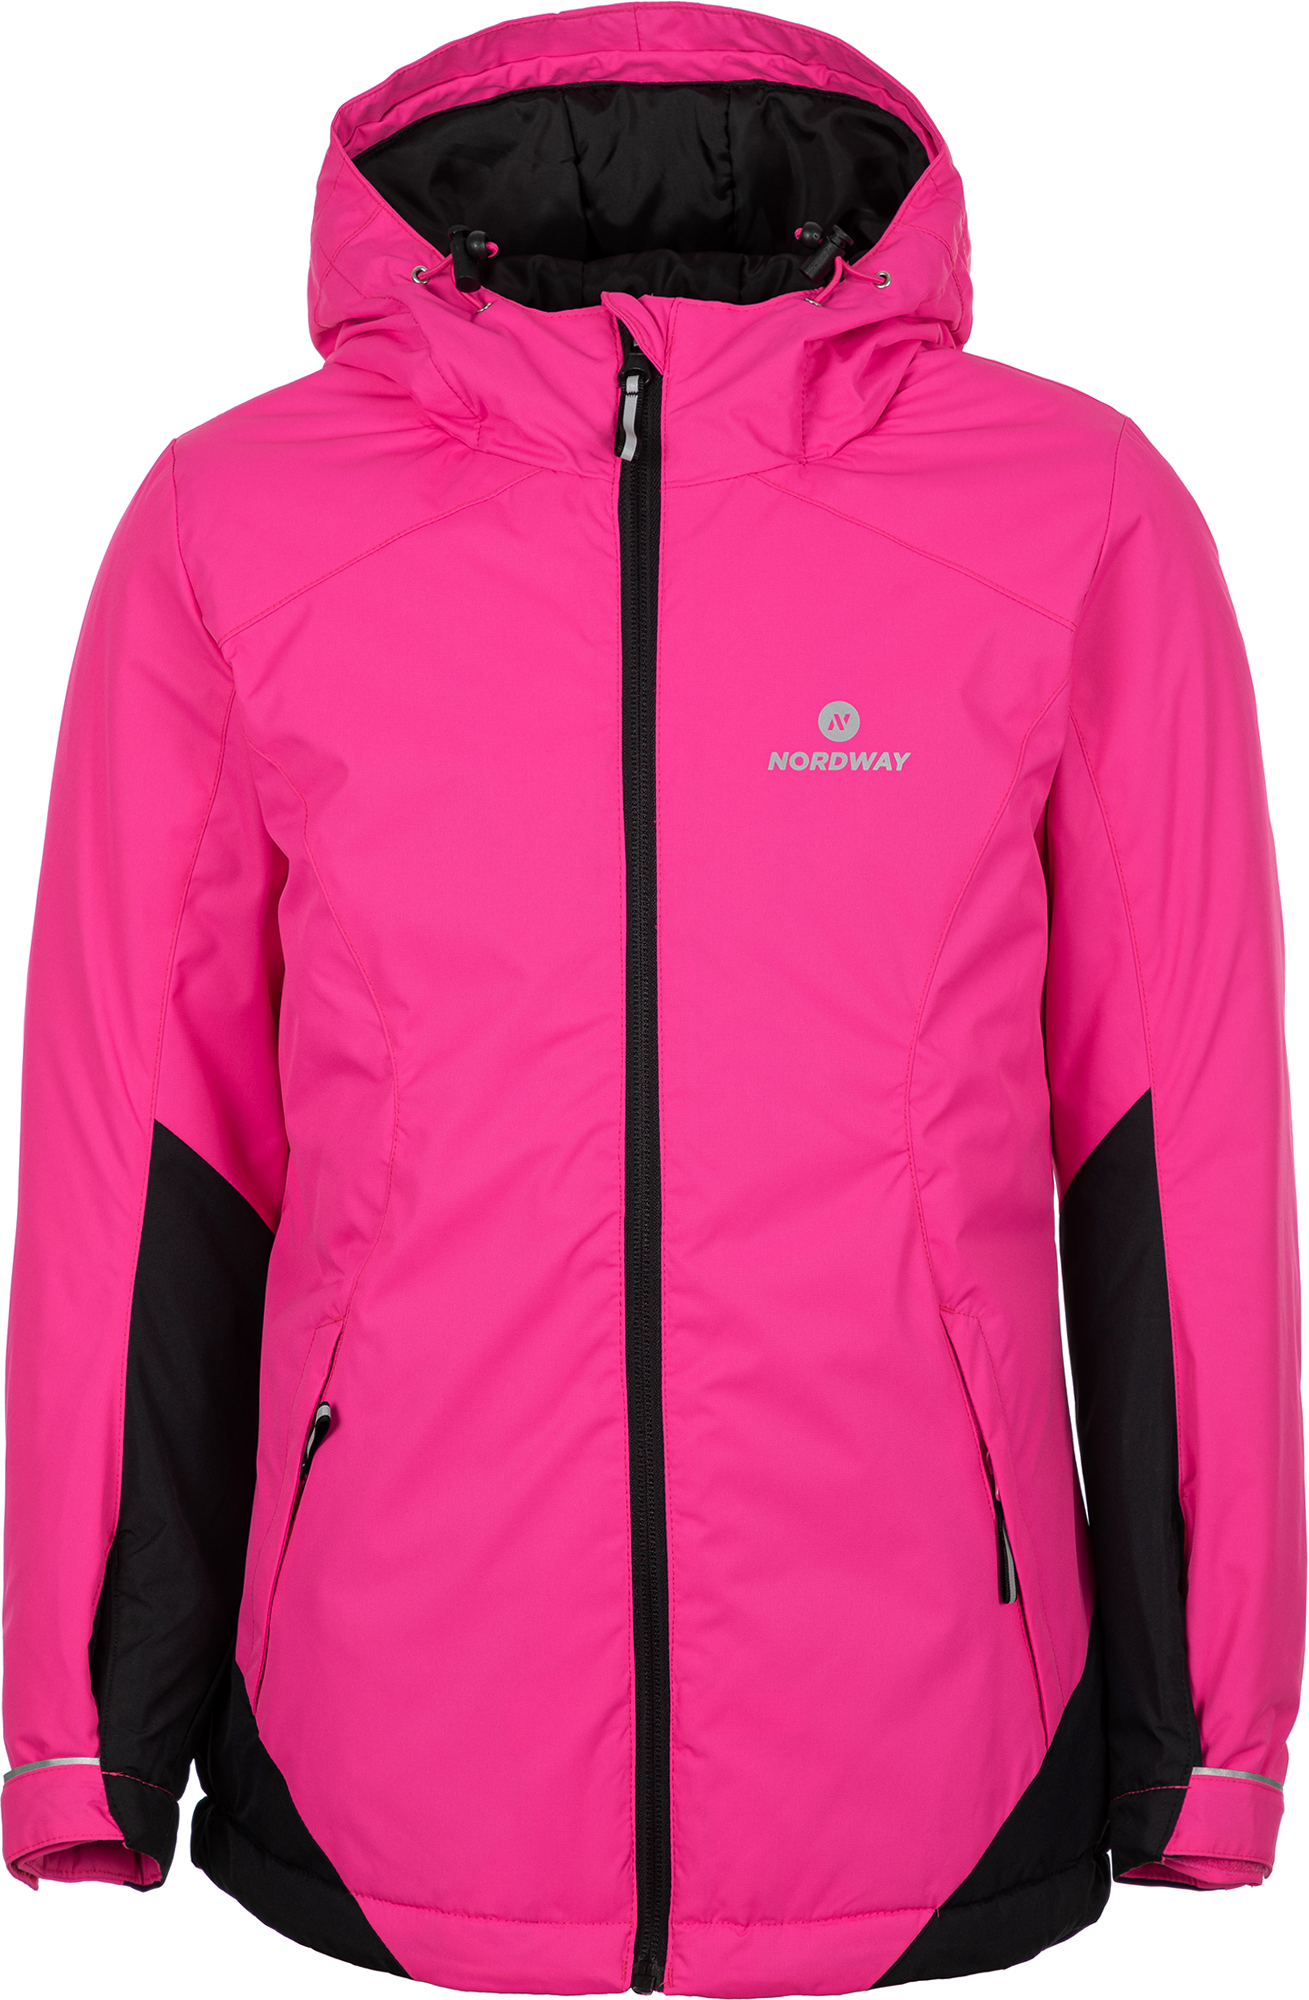 Nordway Куртка для девочек Nordway, размер 158